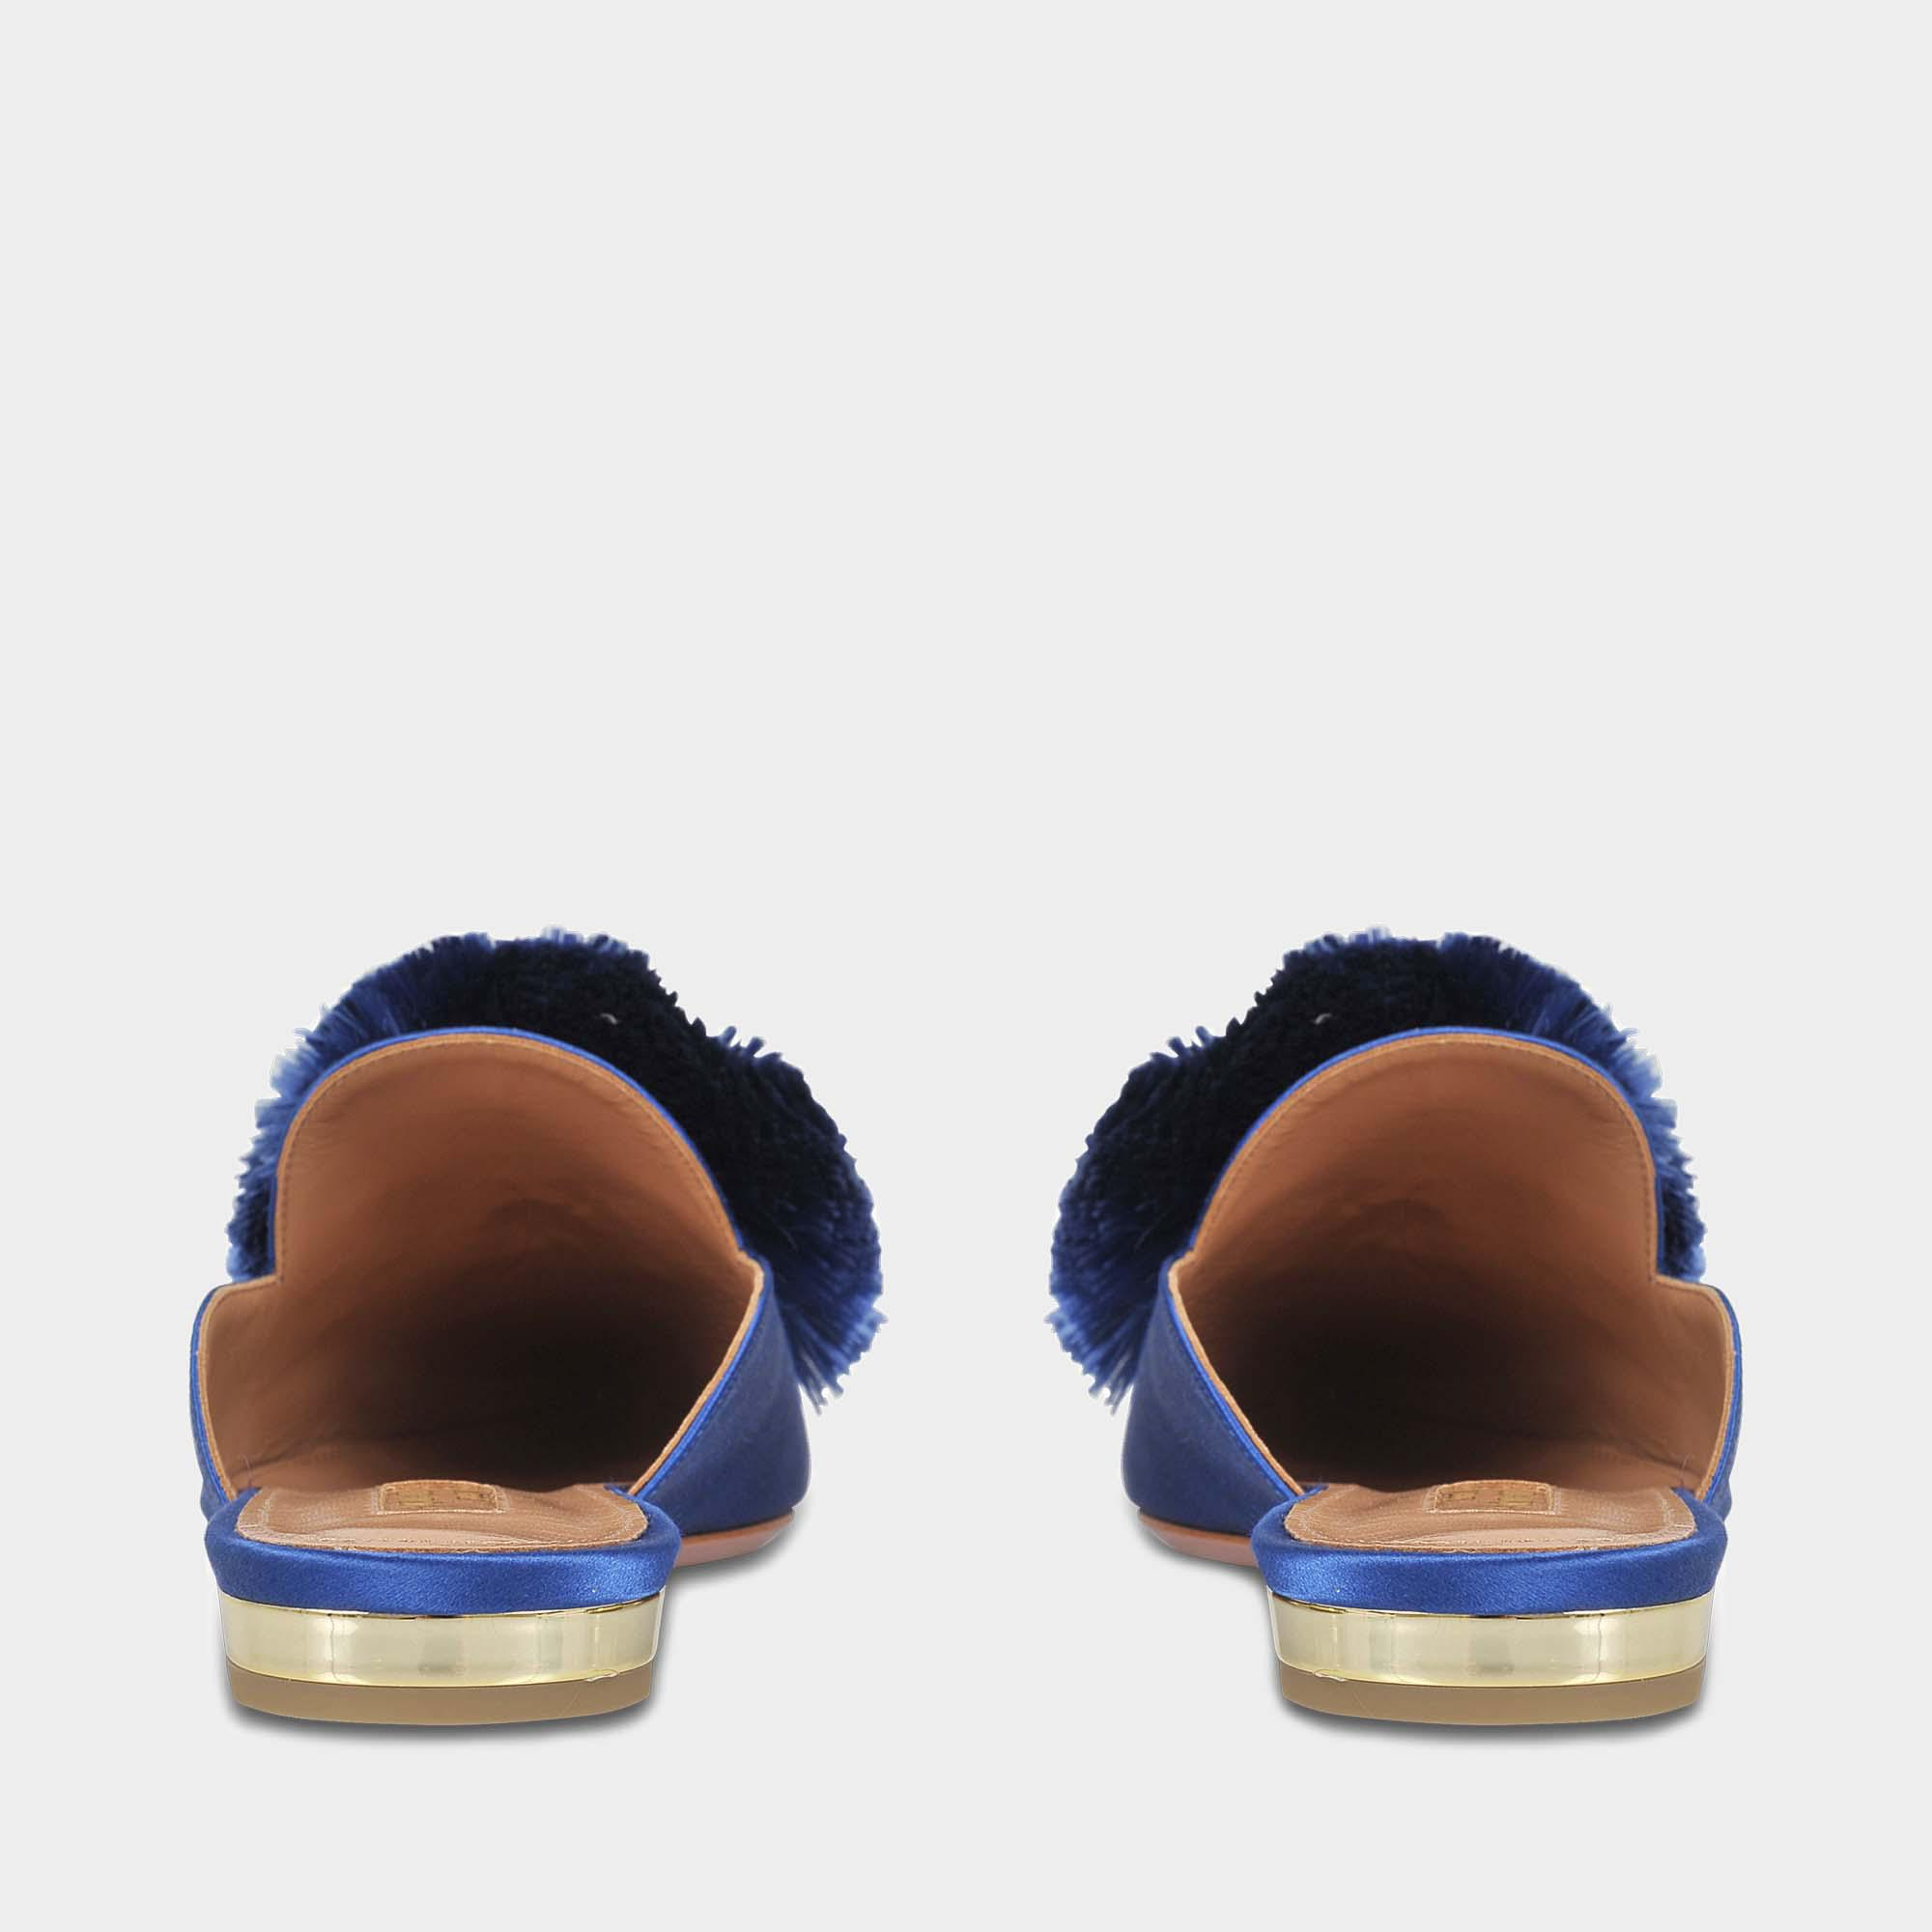 Powder Puff Flat Shoes in Ble Blue Bell Satin Aquazzura iGyrXts9V